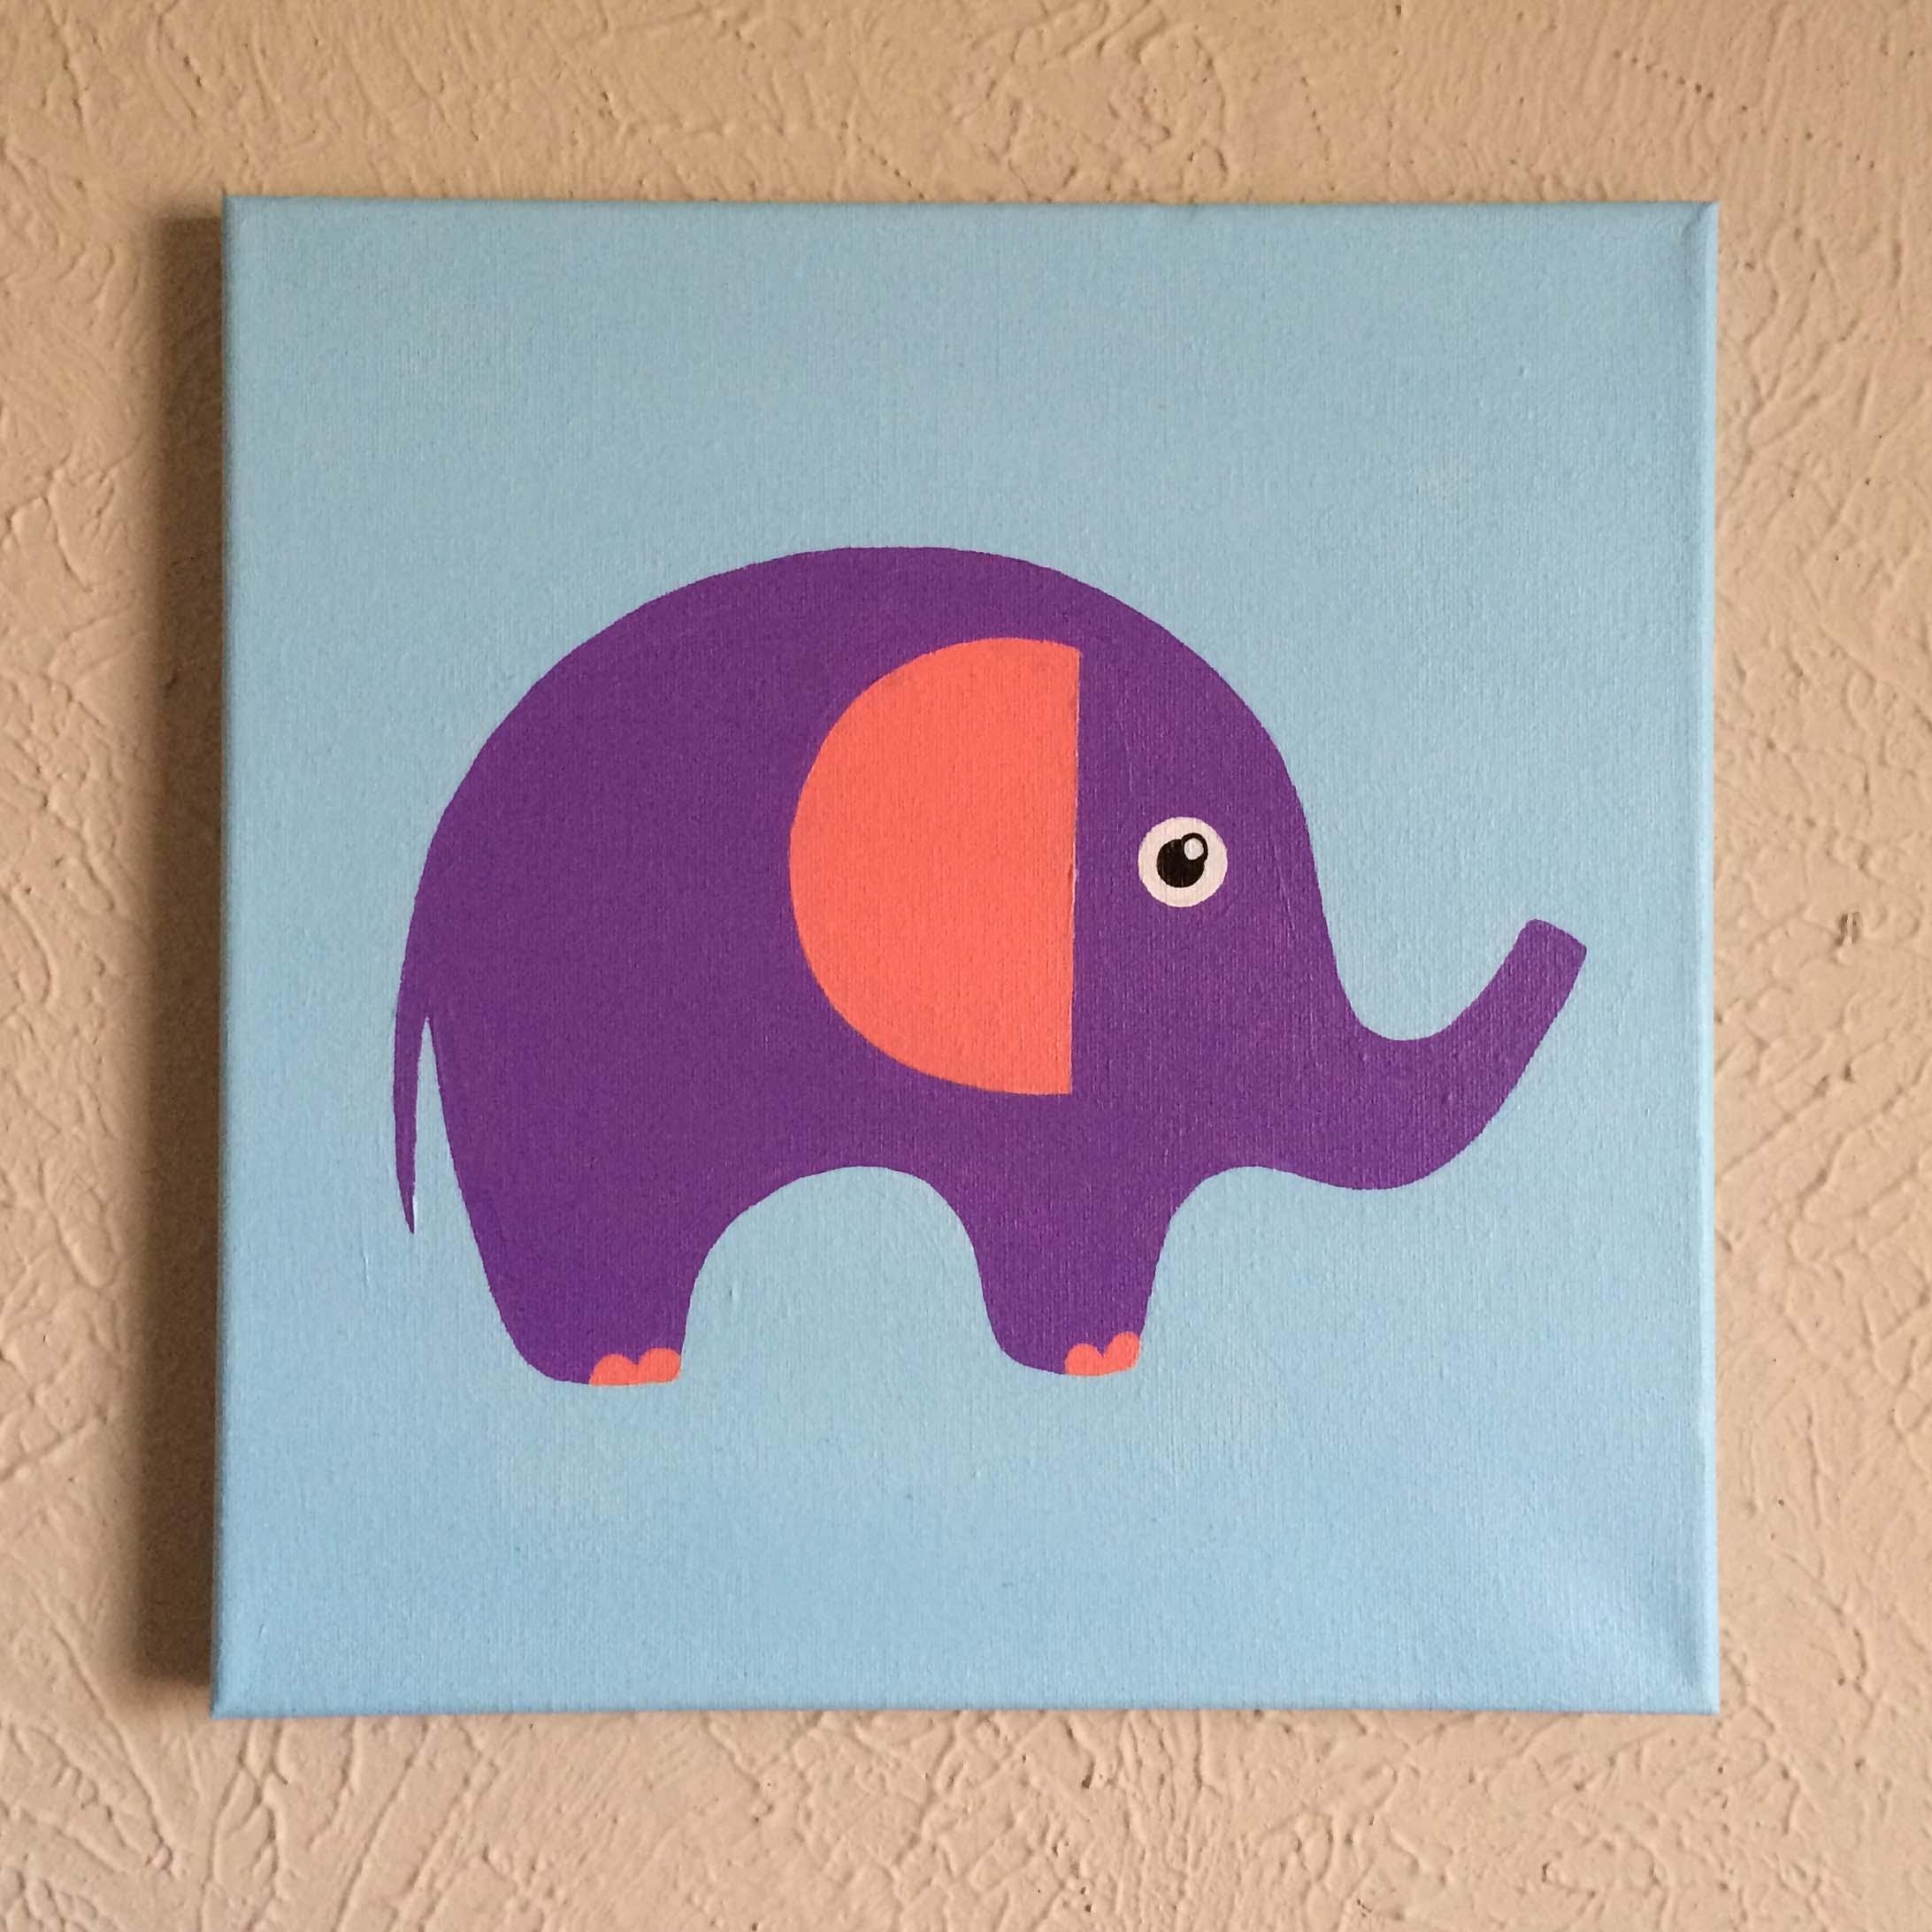 "Original Hand Made Elephant Nursery Wall Art, 12"" X 12"" Acrylic Inside Current Elephant Canvas Wall Art (View 18 of 20)"